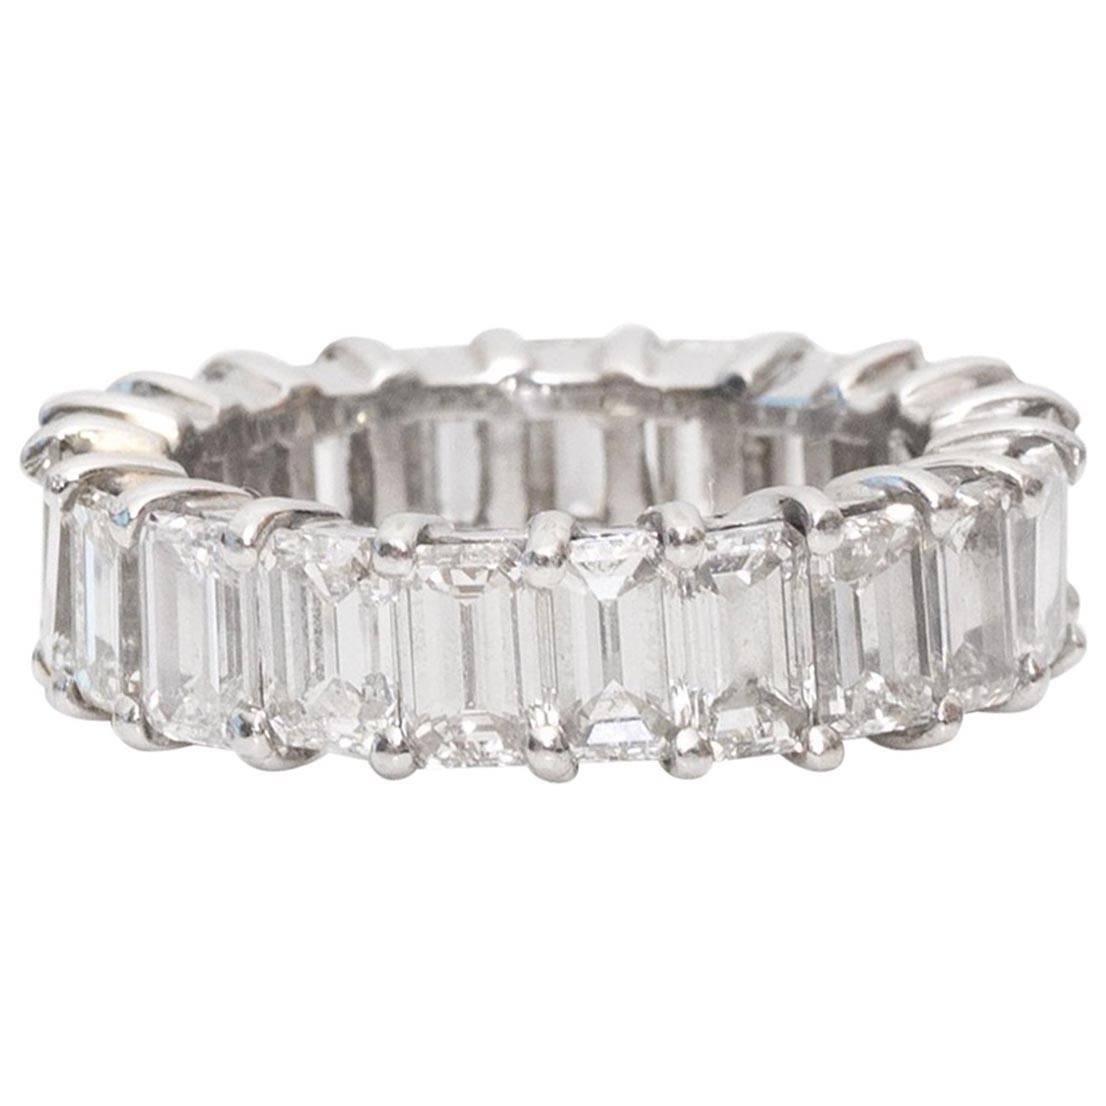 10 Carat Emerald-Cut Diamonds Platinum Eternity Band Ring